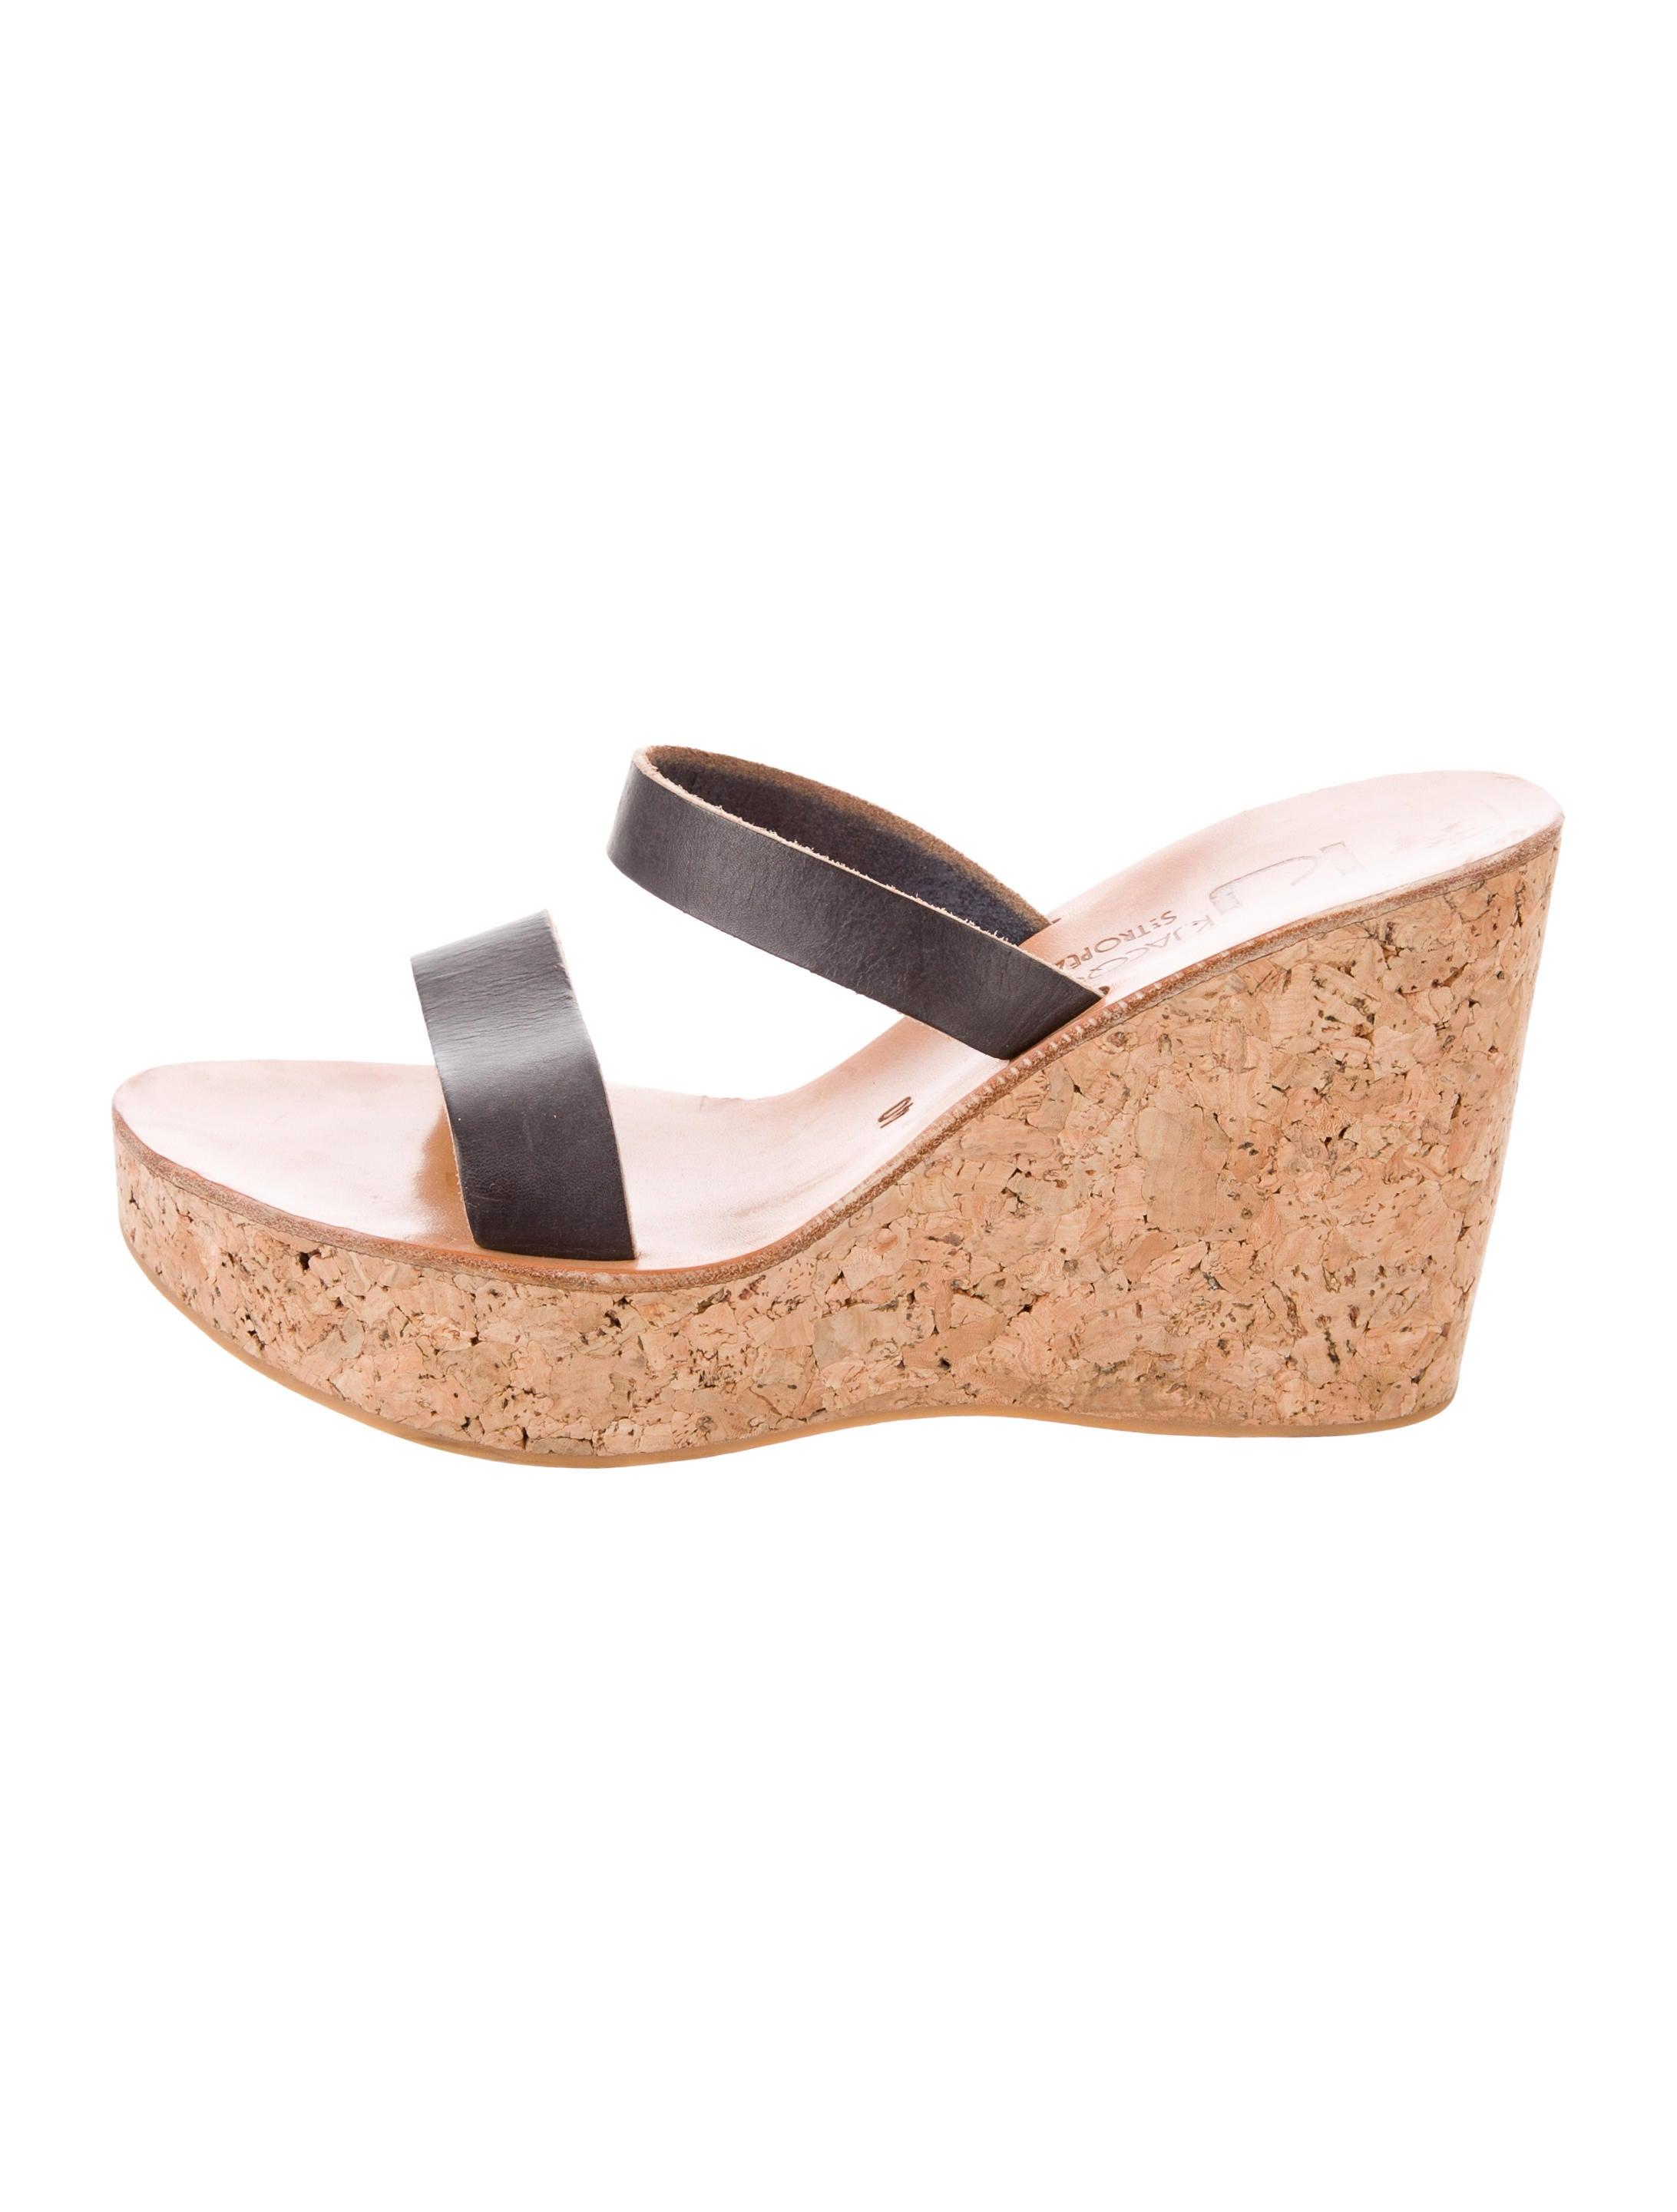 100% authentic cheap price K Jacques St. Tropez Platform Wedge Sandals buy cheap shop offer outlet deals cheap excellent with mastercard online Ju7R3